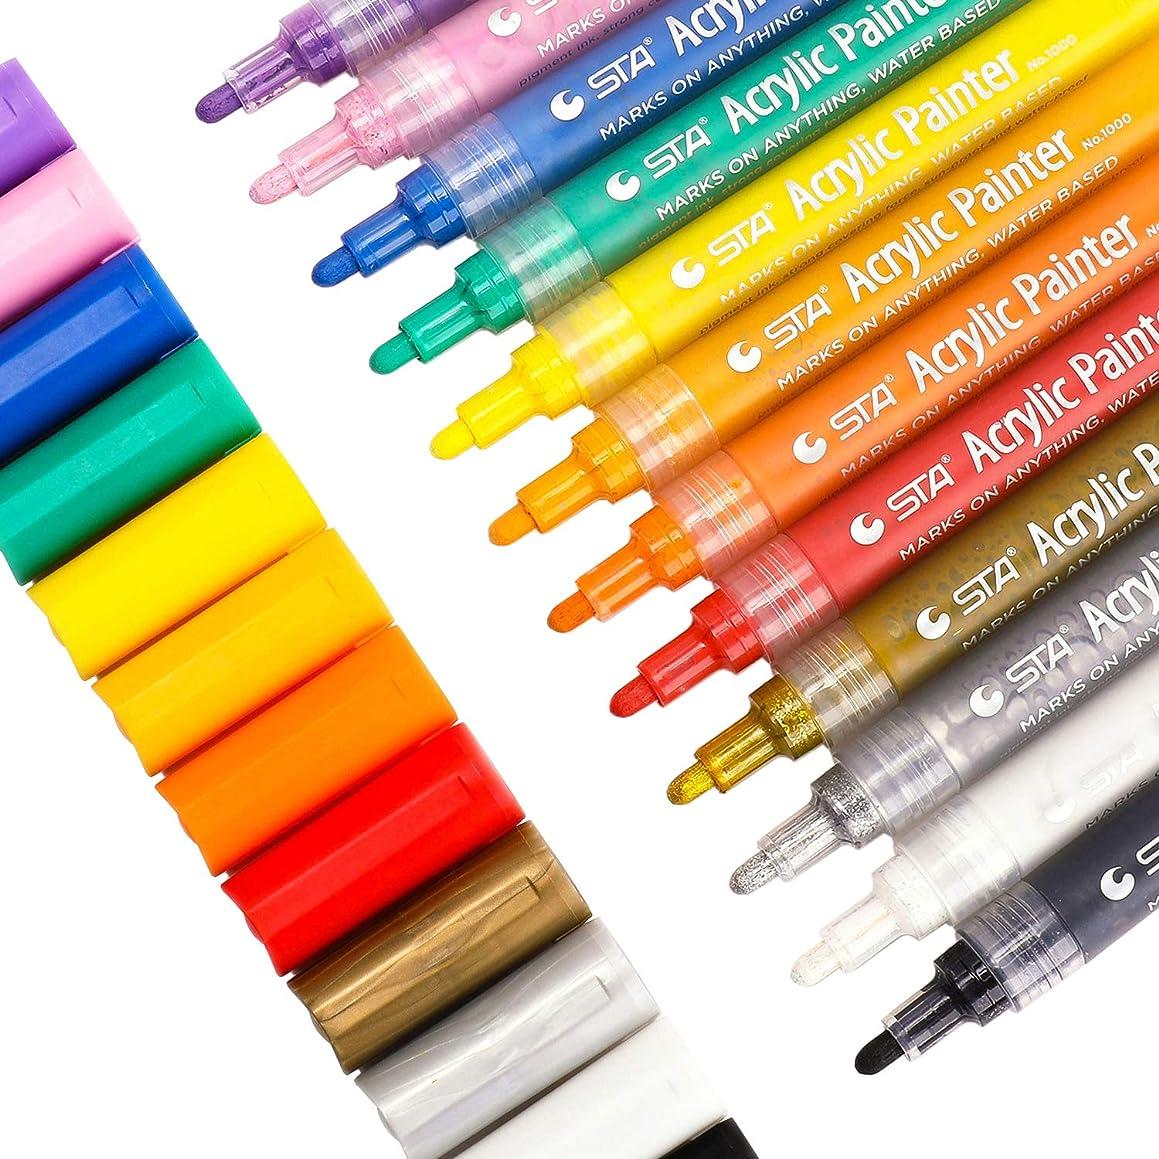 Paint Pens for Rock Painting, Canvas, Fabric, Wood, Ceramic, Glass, Mugs, Pumpkins, DIY Crafts, Scrapbooking Supplies, Card Making, Acrylic Paint Marker Pens Permanent, 12 Colors